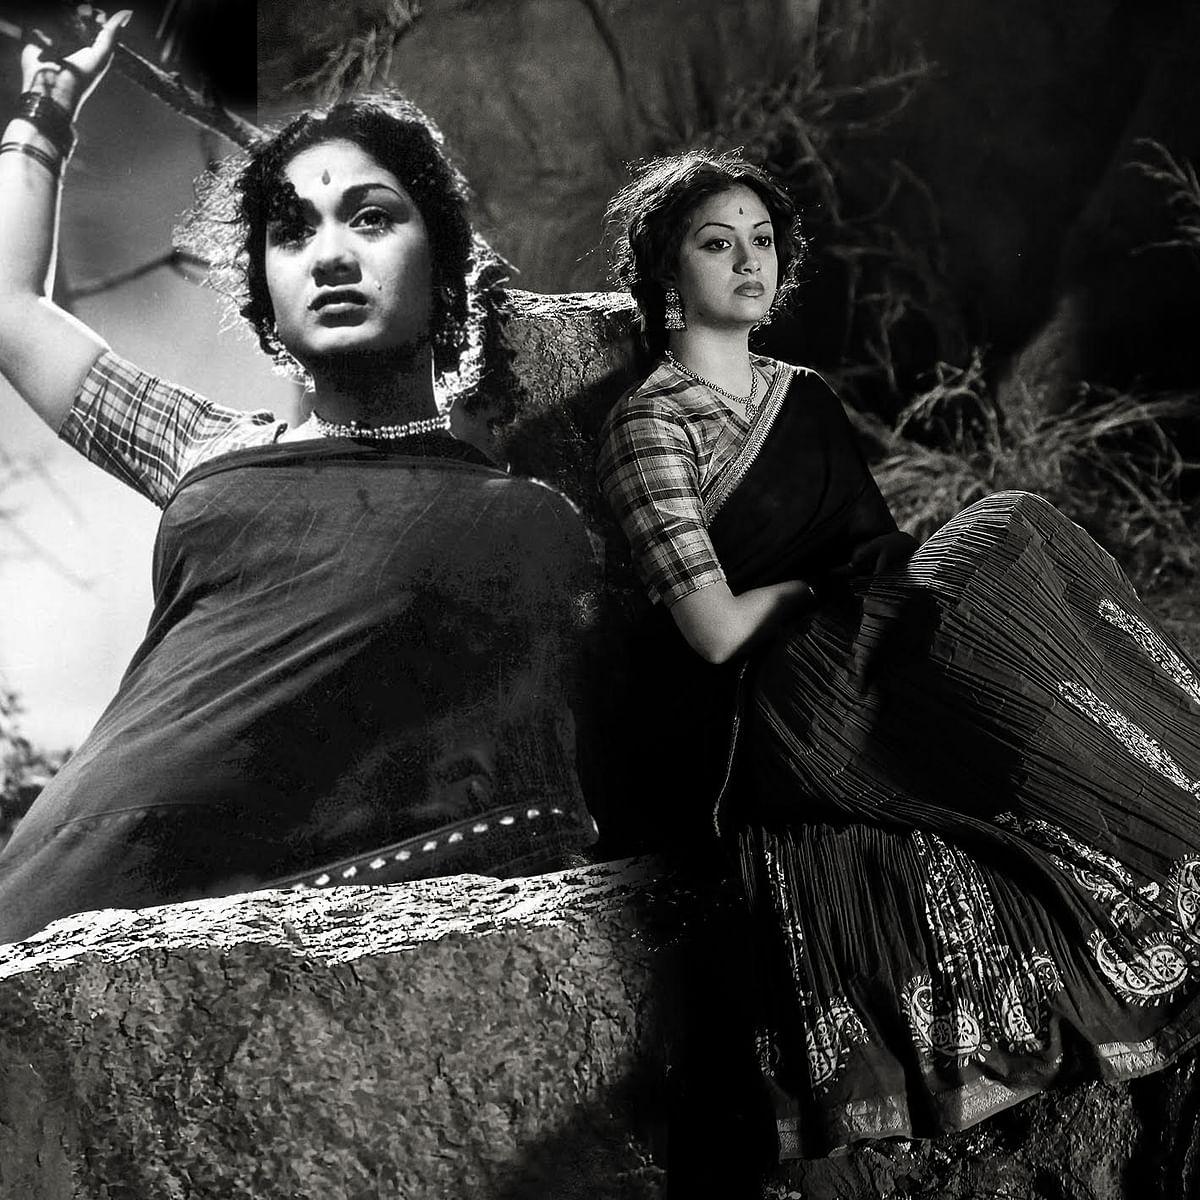 Keerthy Suresh as Savitri in the biopic <i>Mahanati</i>.